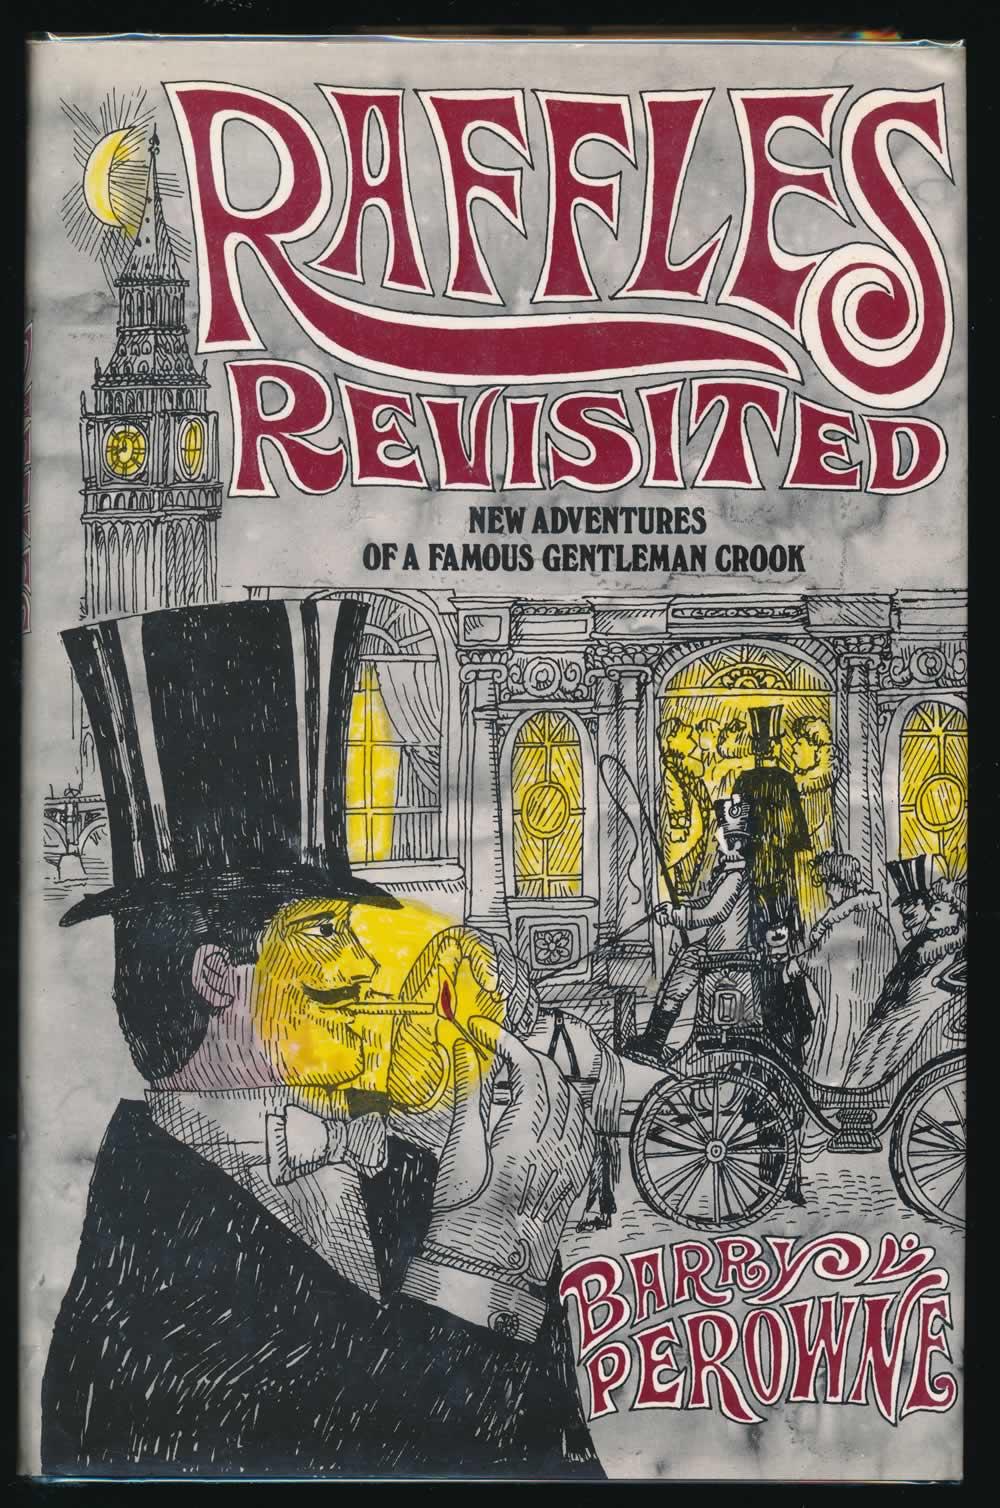 Raffles revisited: new adventures of a famous gentleman crook